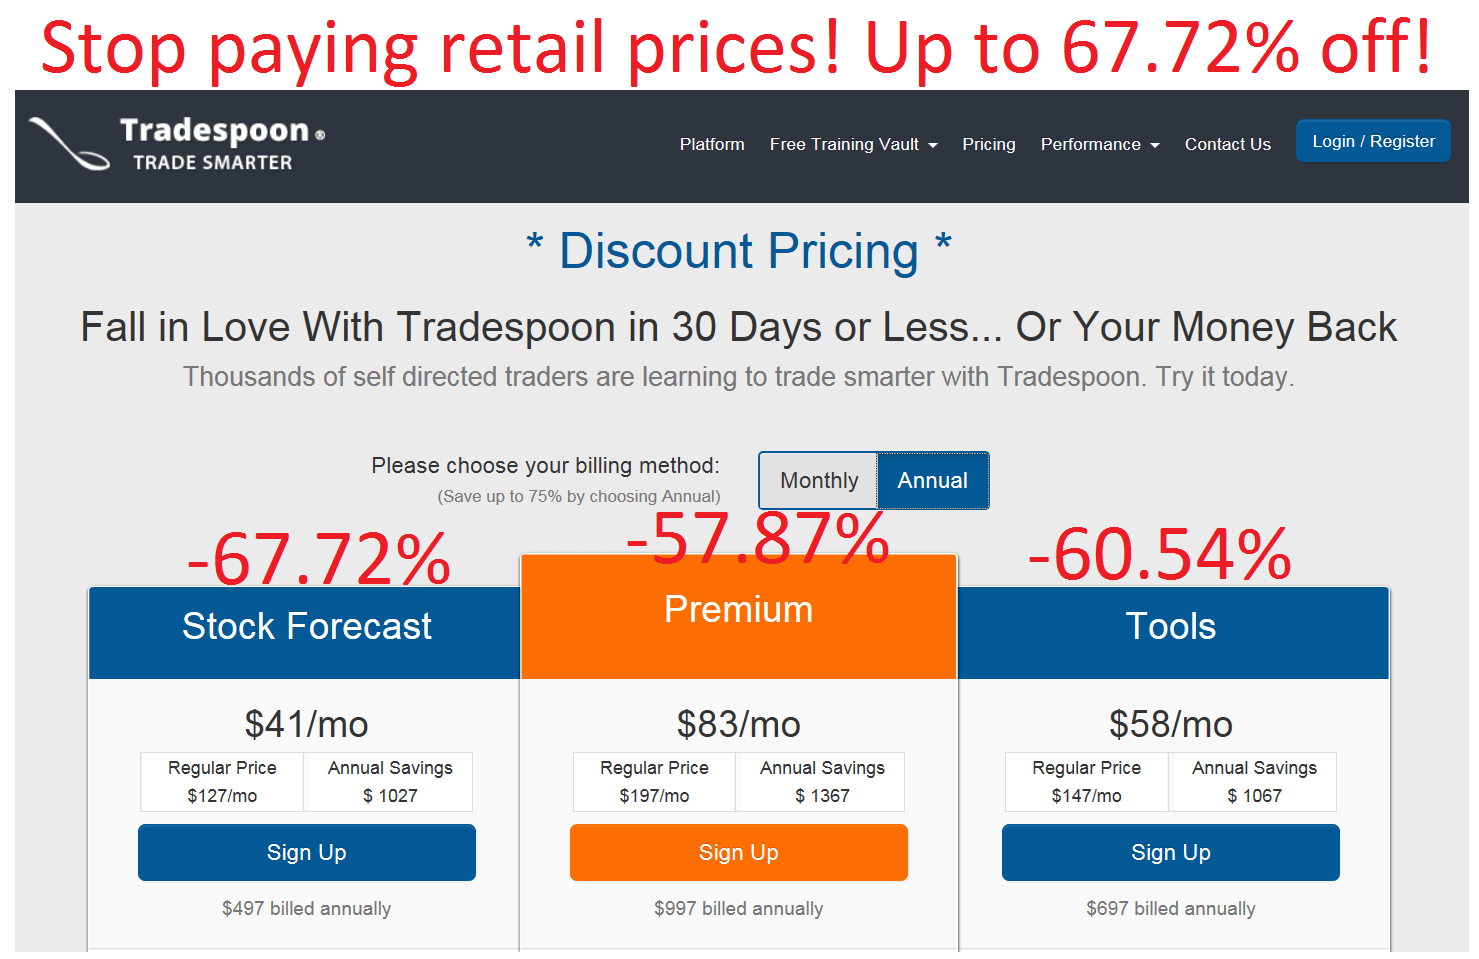 Tradespoon Promo Codes and Discounts